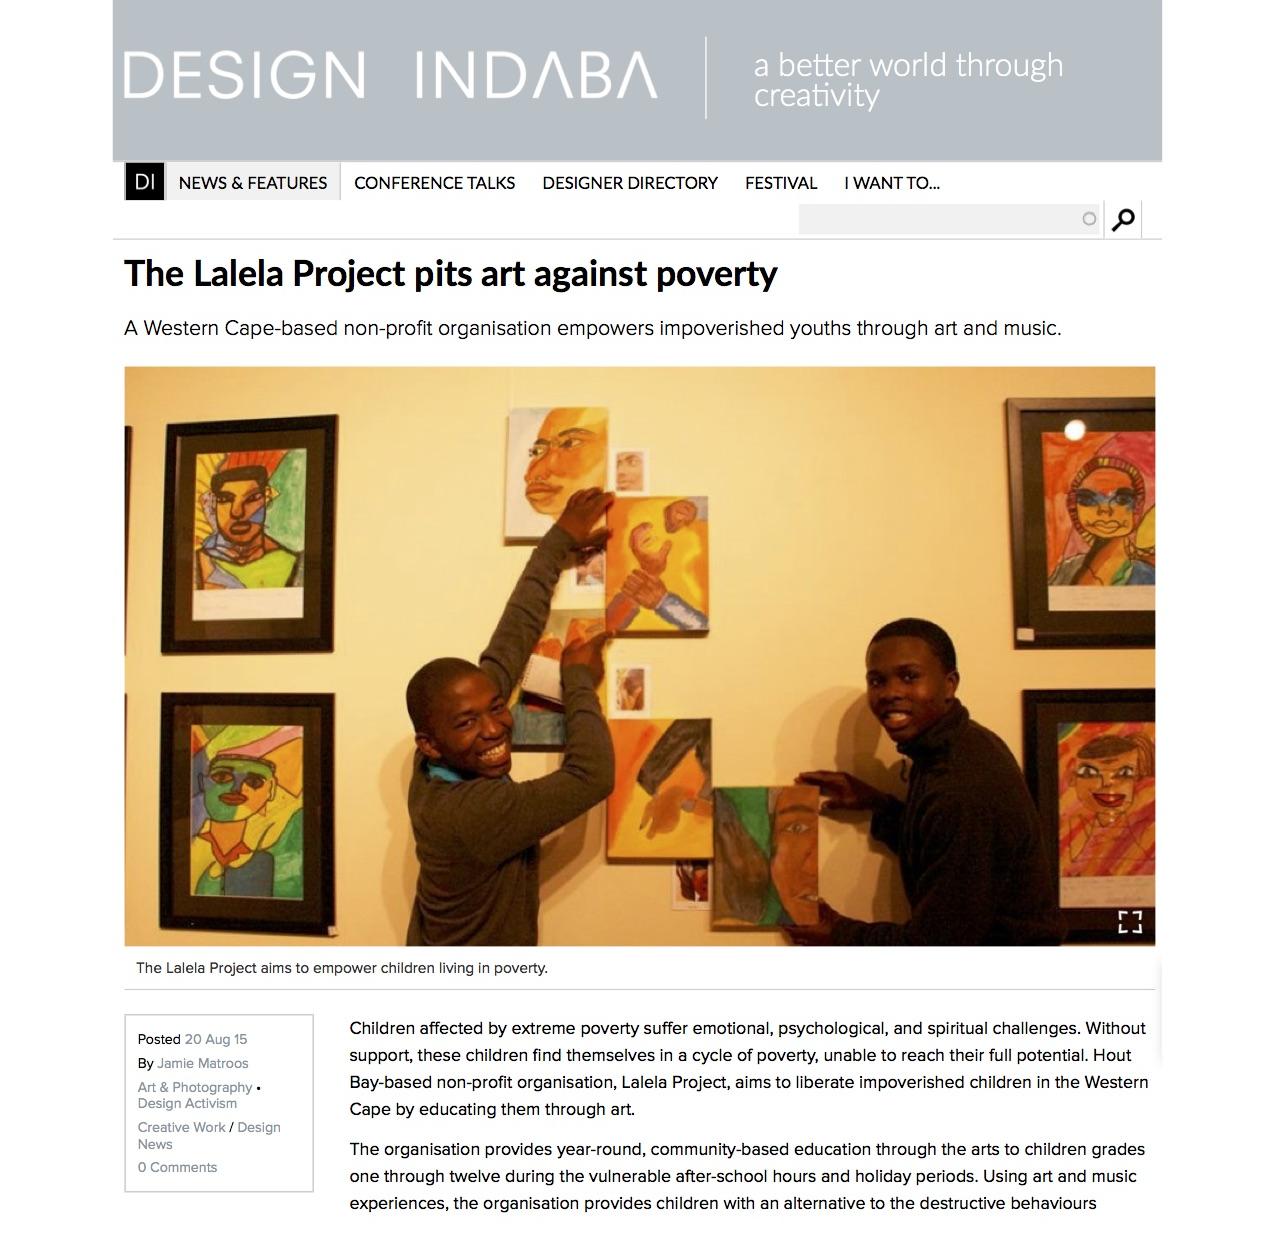 2015.08.20 Design Indaba.jpg